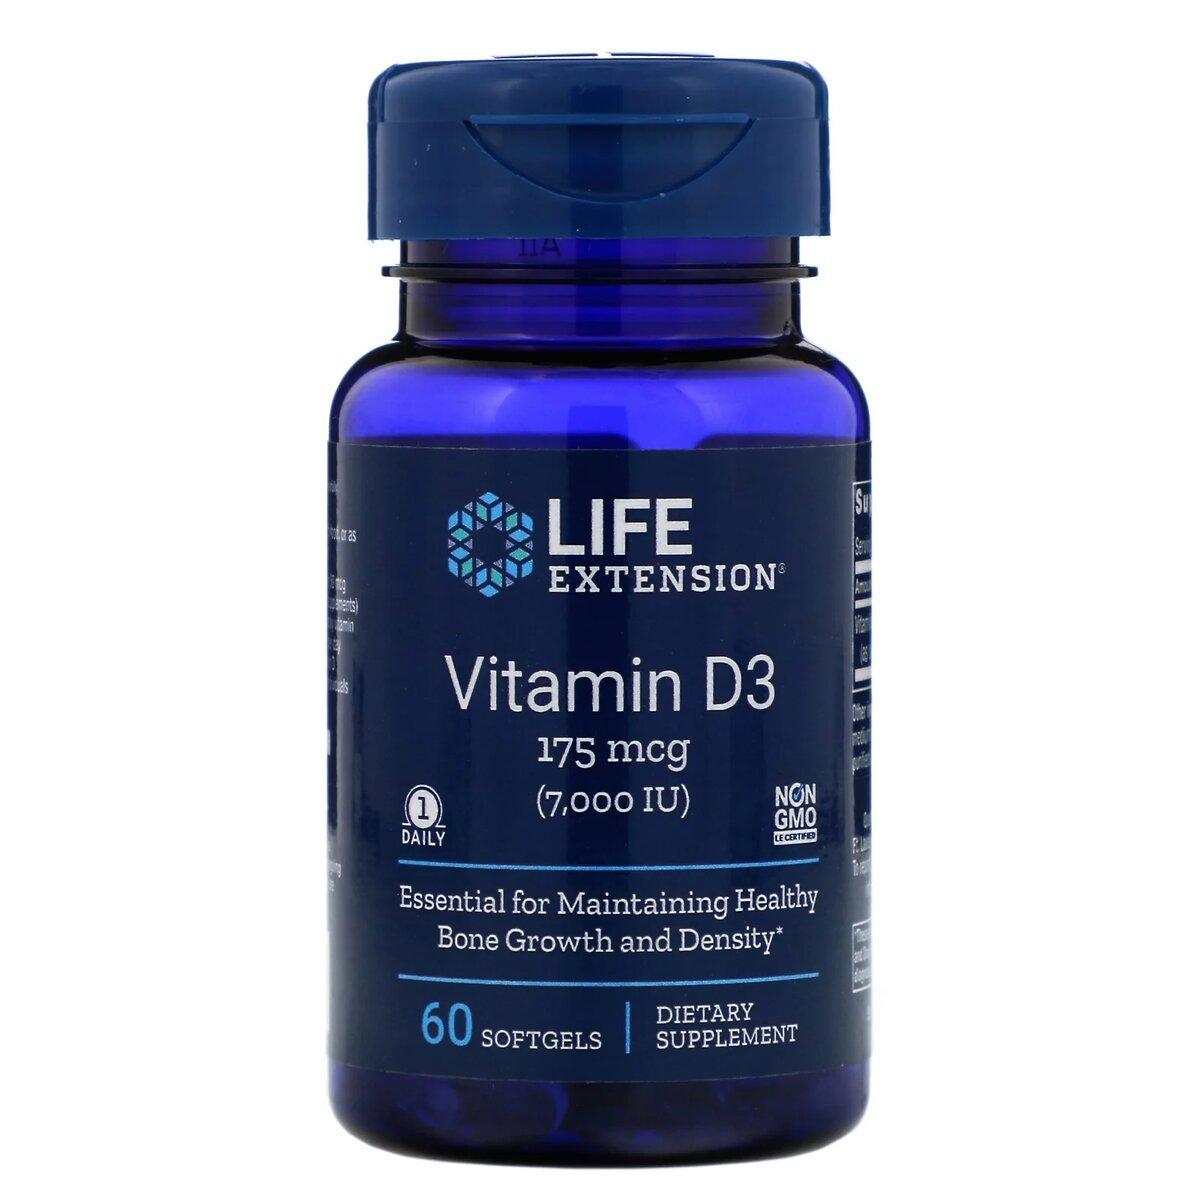 Витамин D3, Life Extension, Vitamin D3, 175 мкг (7000 МЕ), 60 гелевых капсул